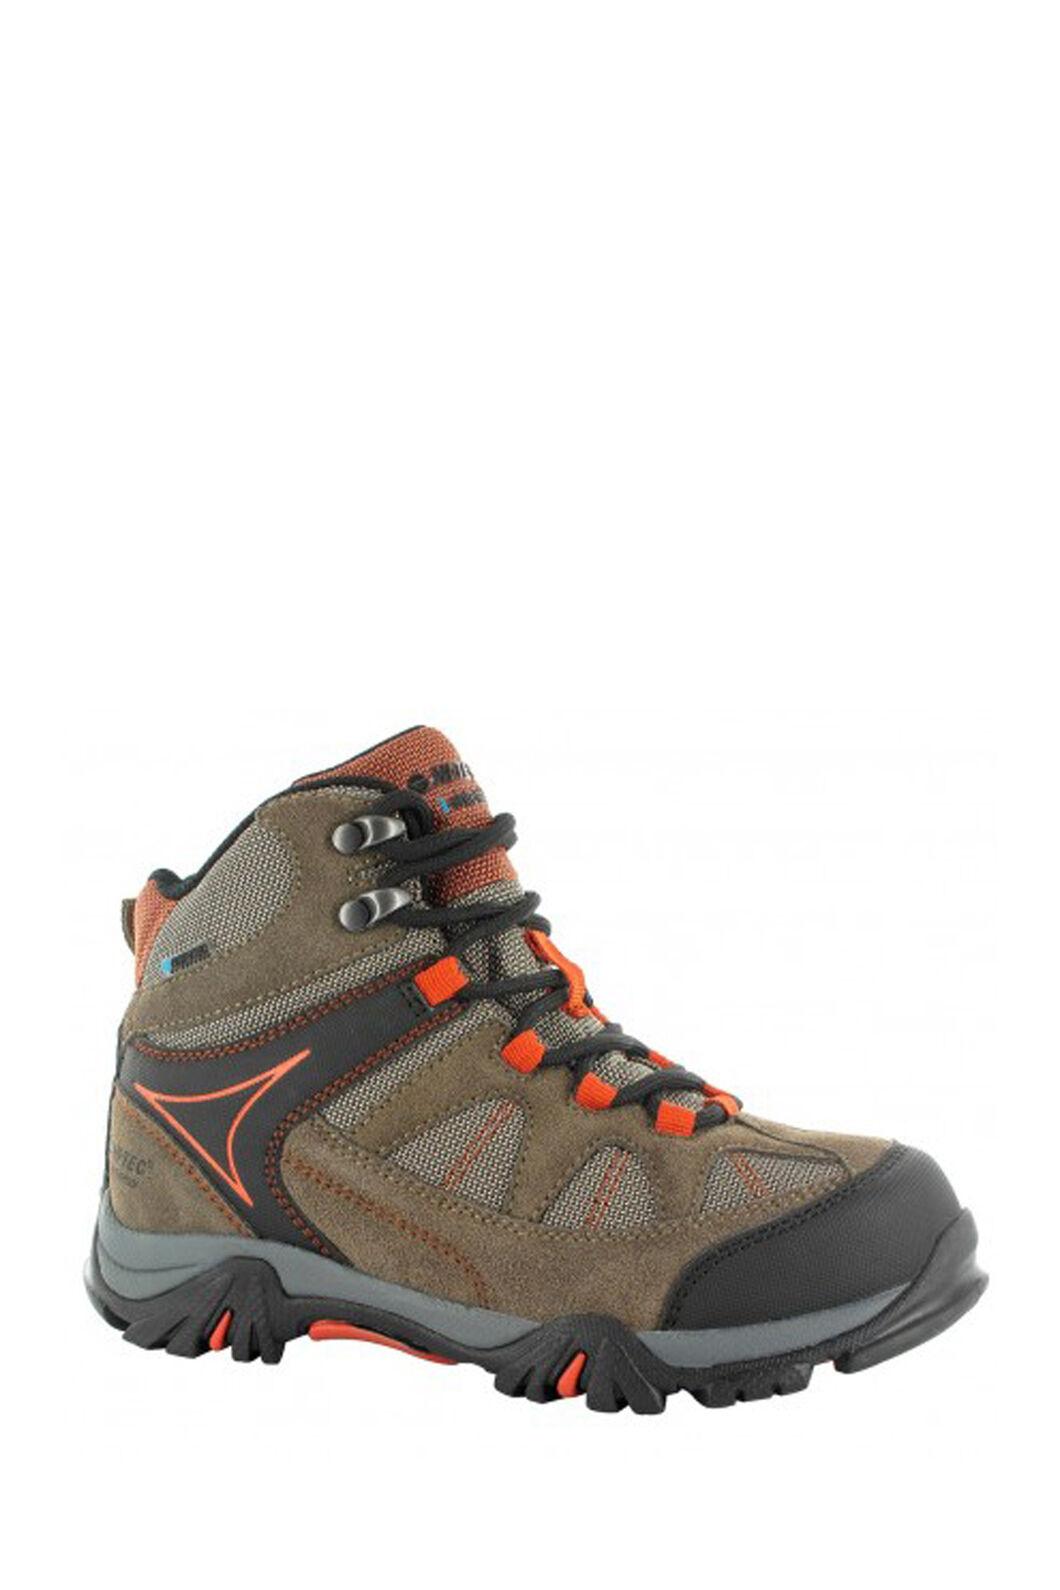 aecb3d3102f Hi-Tec Kids' Altitude Lite Hiking Boot | Macpac